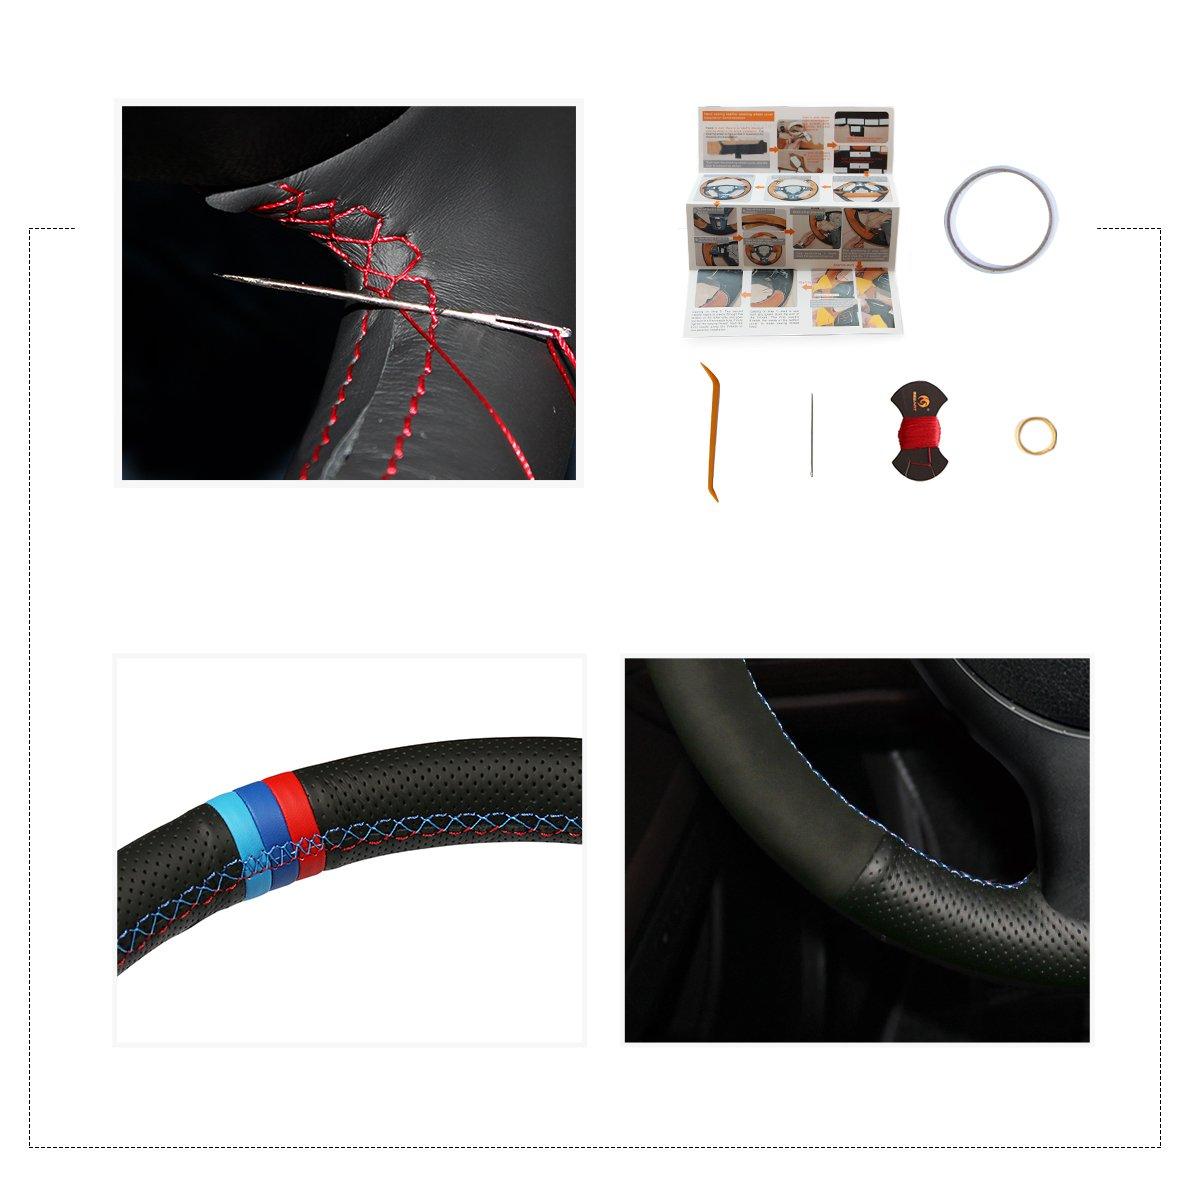 MEWANT Customized Hand Sewing Black Suede Car Steering Wheel Cover for E46 E39 330i 540i 525i 530i 330Ci M3 2001-2003